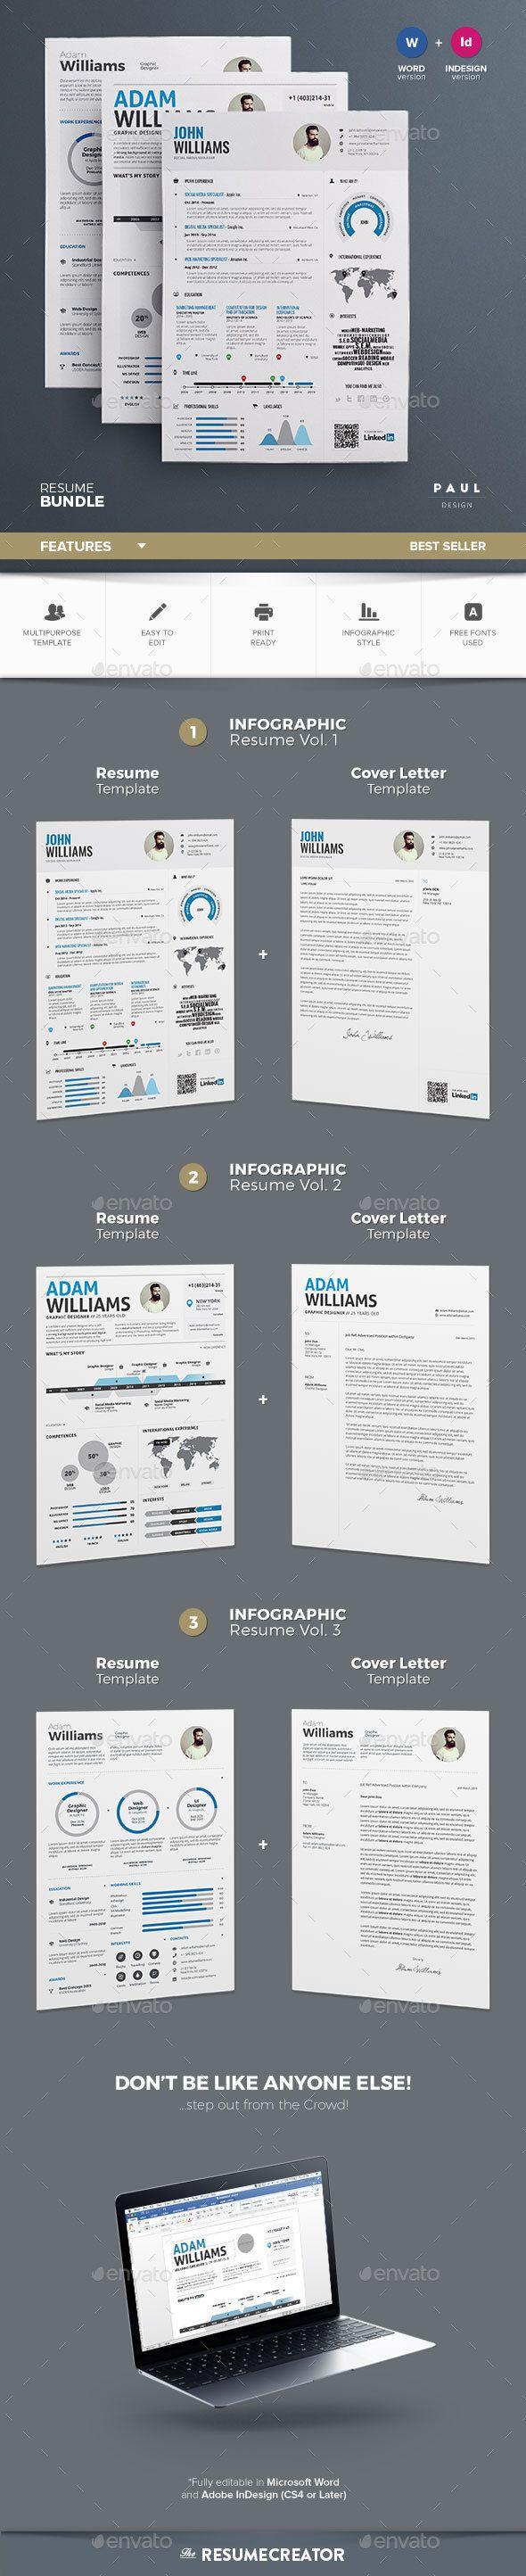 Infographic Resume Bundle 30 best Career images